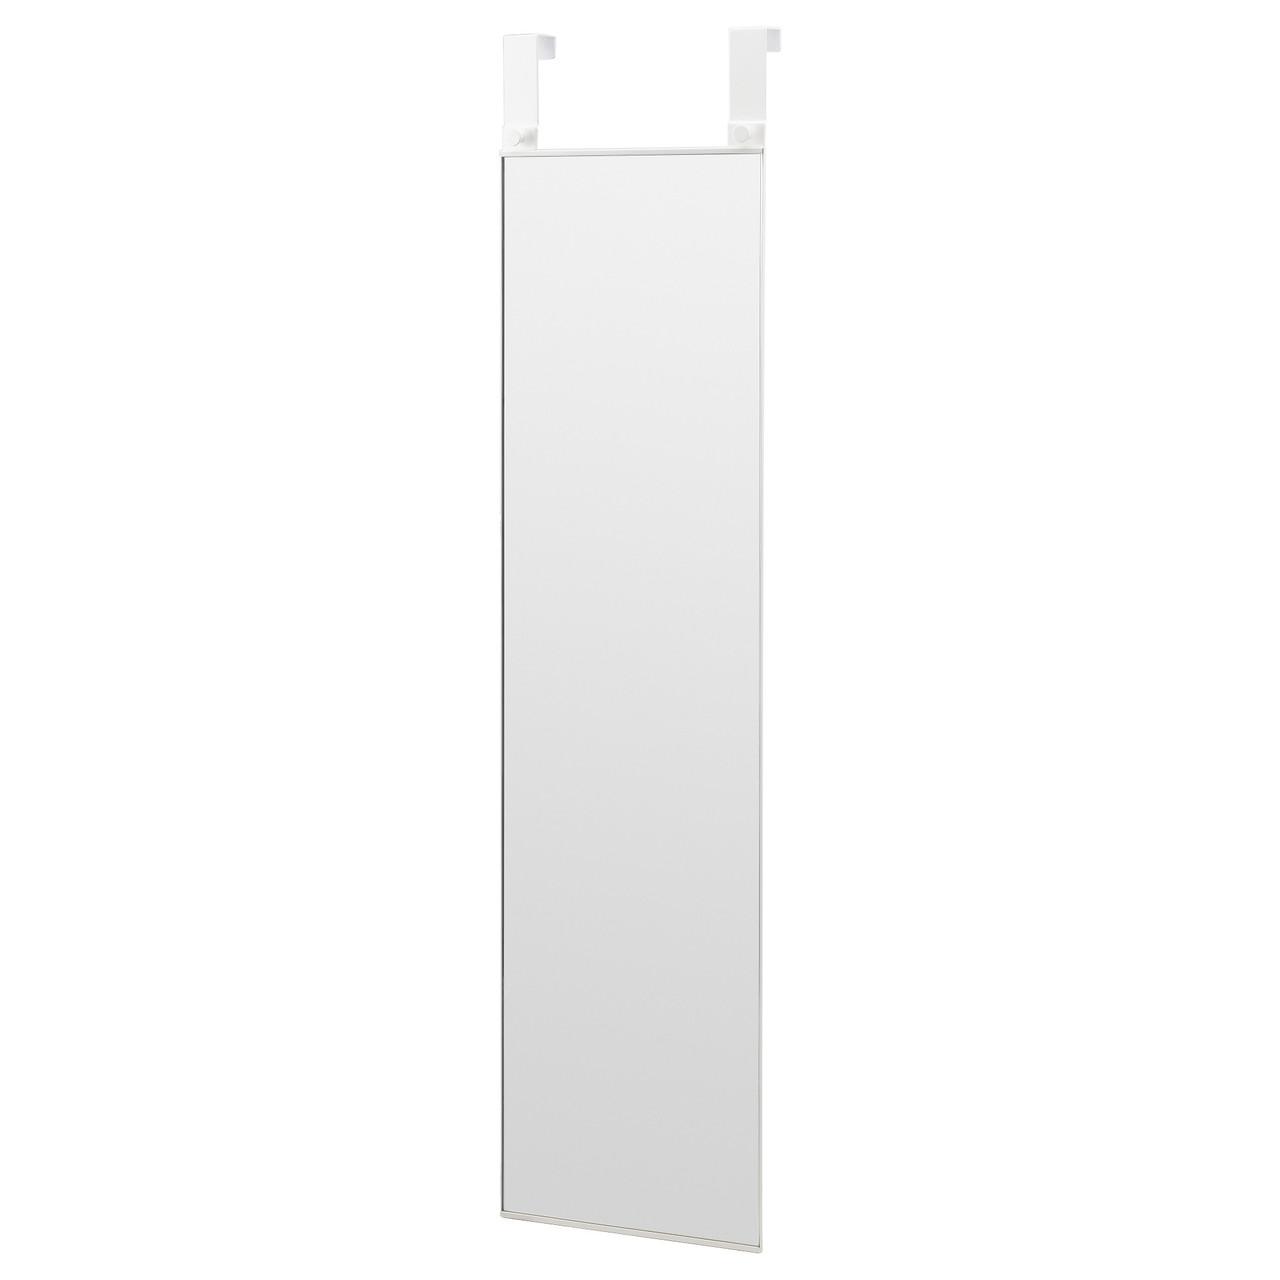 GARNES Надверное зеркало, белый надверное 002.851.83